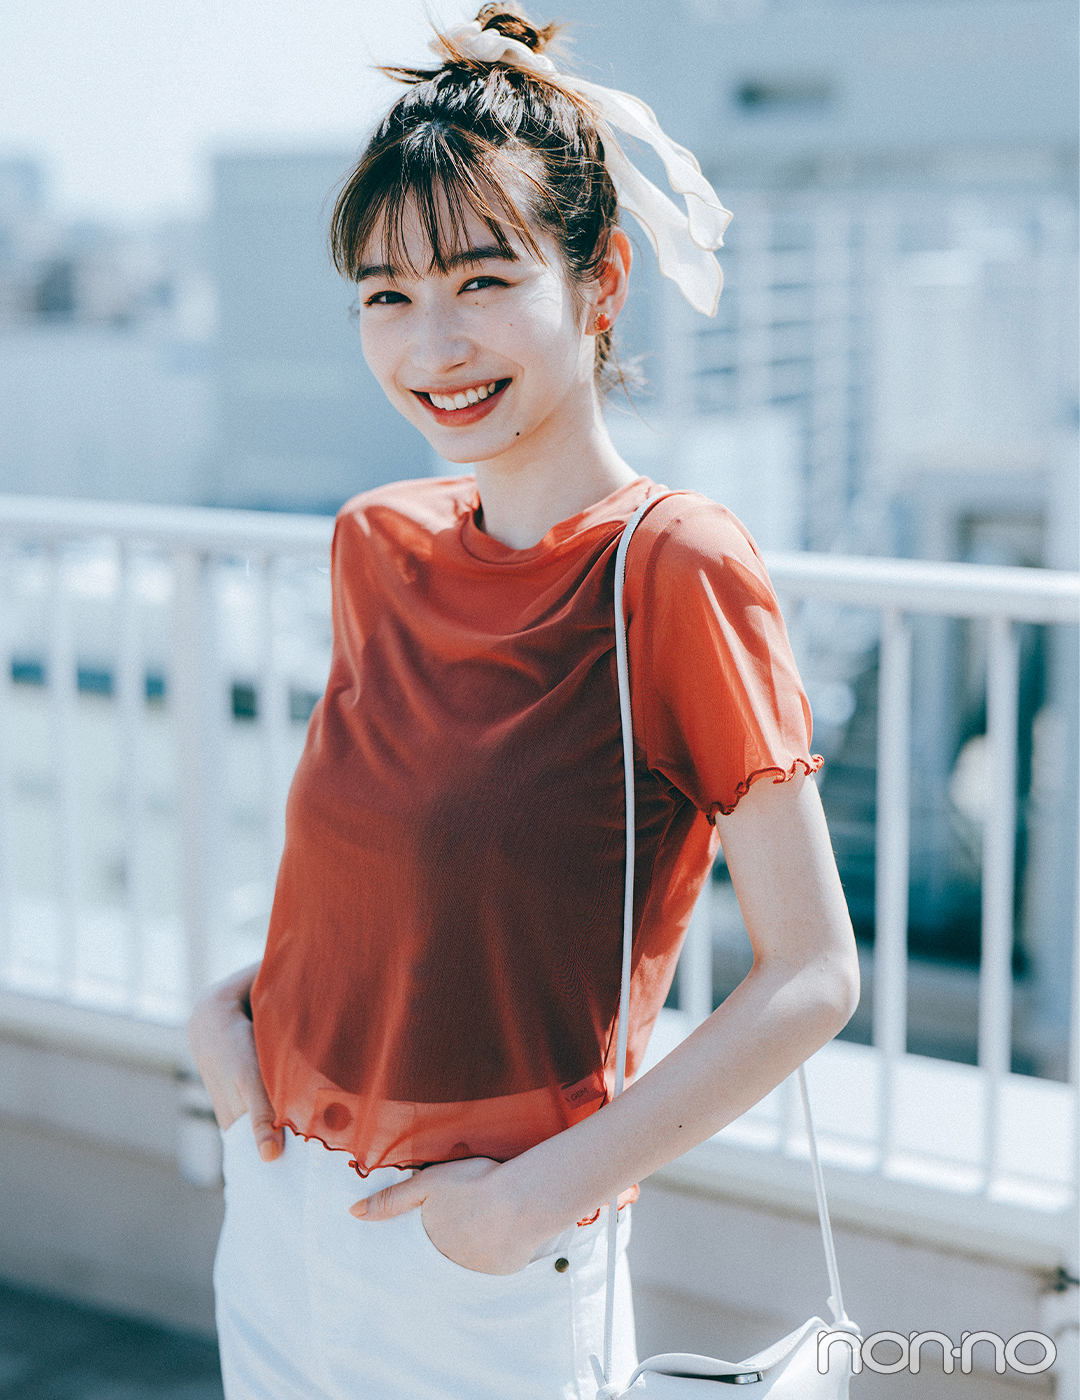 Photo Gallery|ナチュラルな可愛さにきゅん♡ 岡本夏美フォトギャラリー_1_2